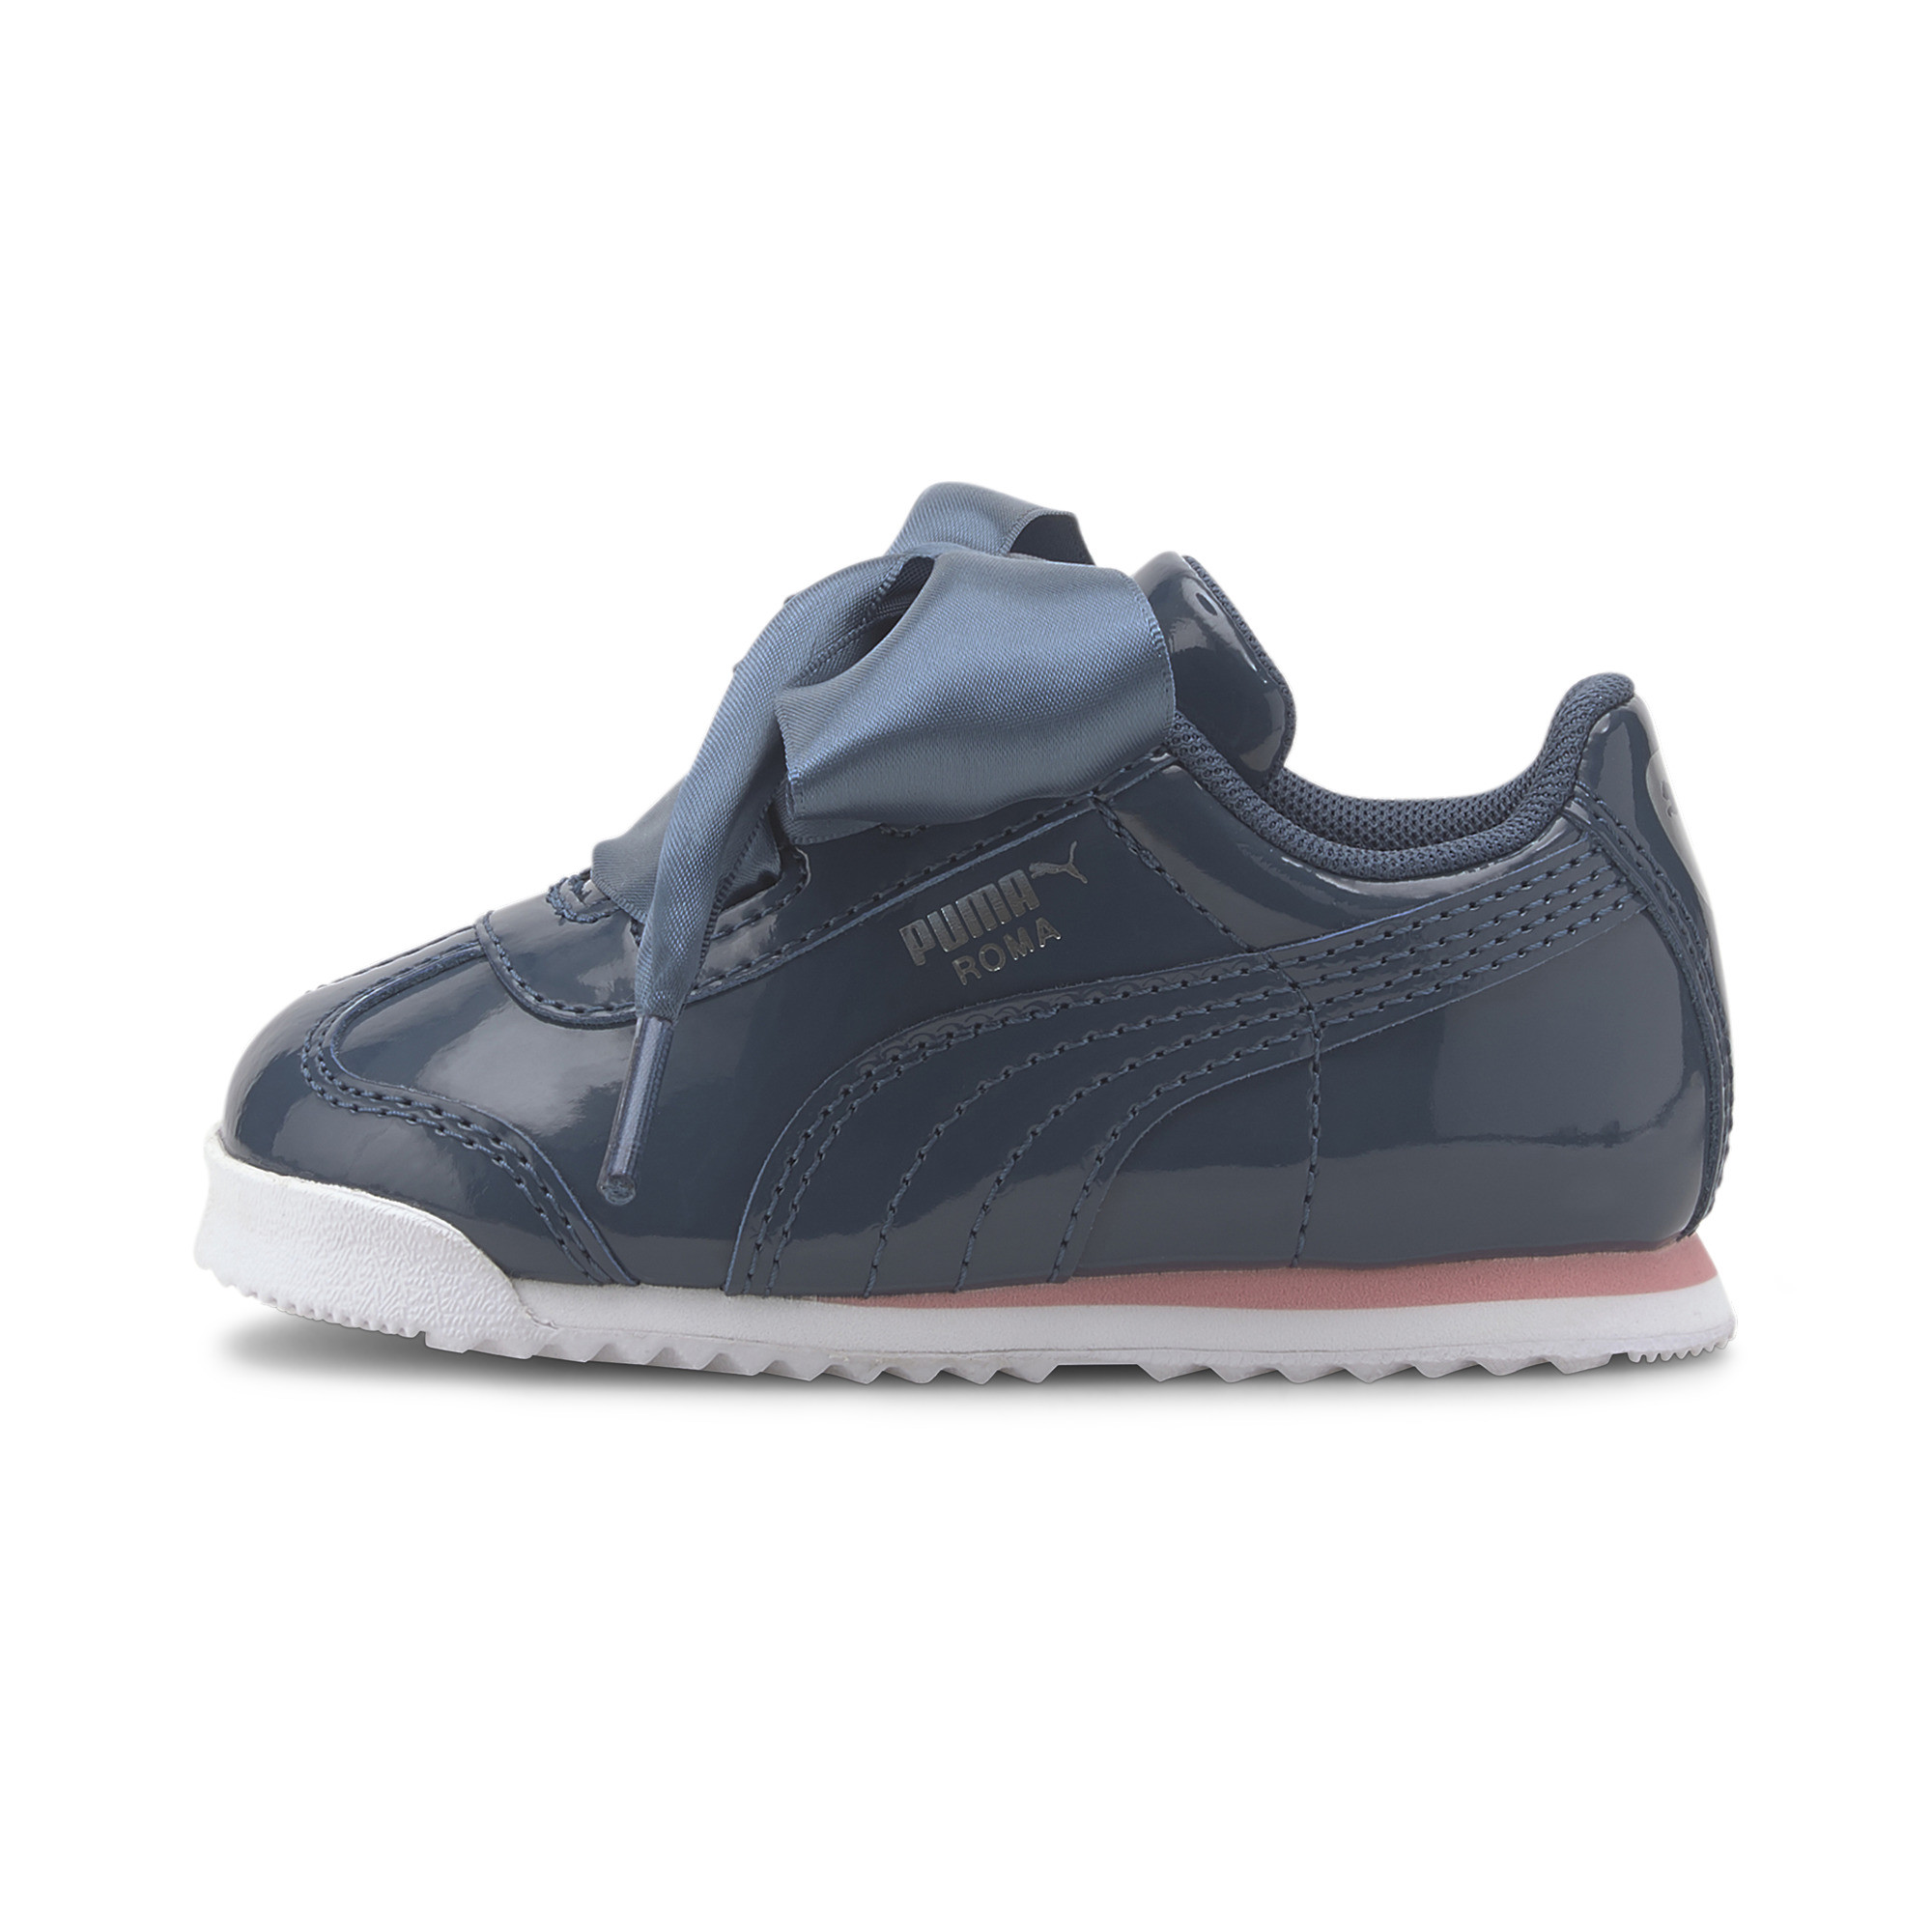 PUMA-Roma-Heart-Patent-Toddler-Shoes-Girls-Shoe-Kids thumbnail 16